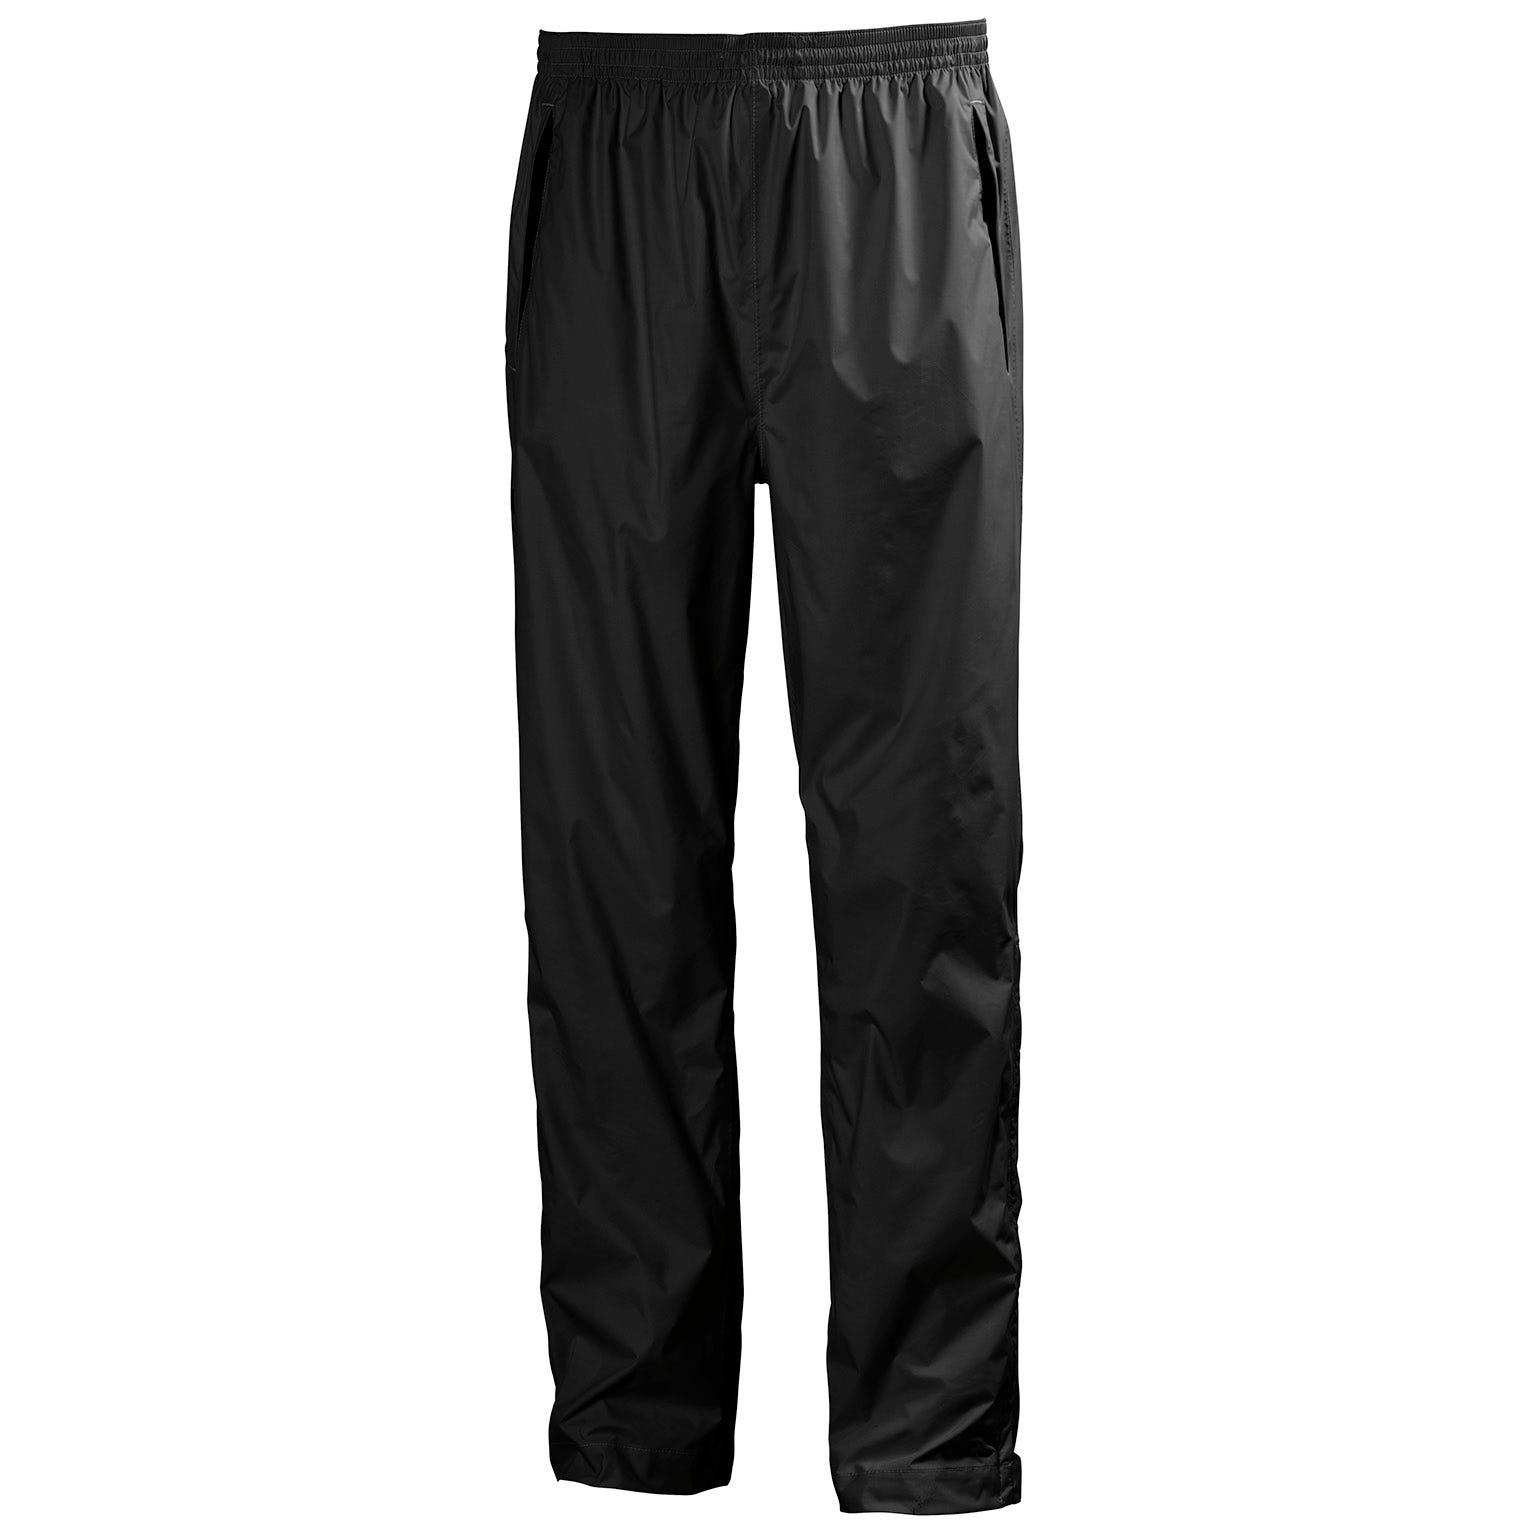 Helly Hansen Mens Loke Trousers Hiking Trouser Black M